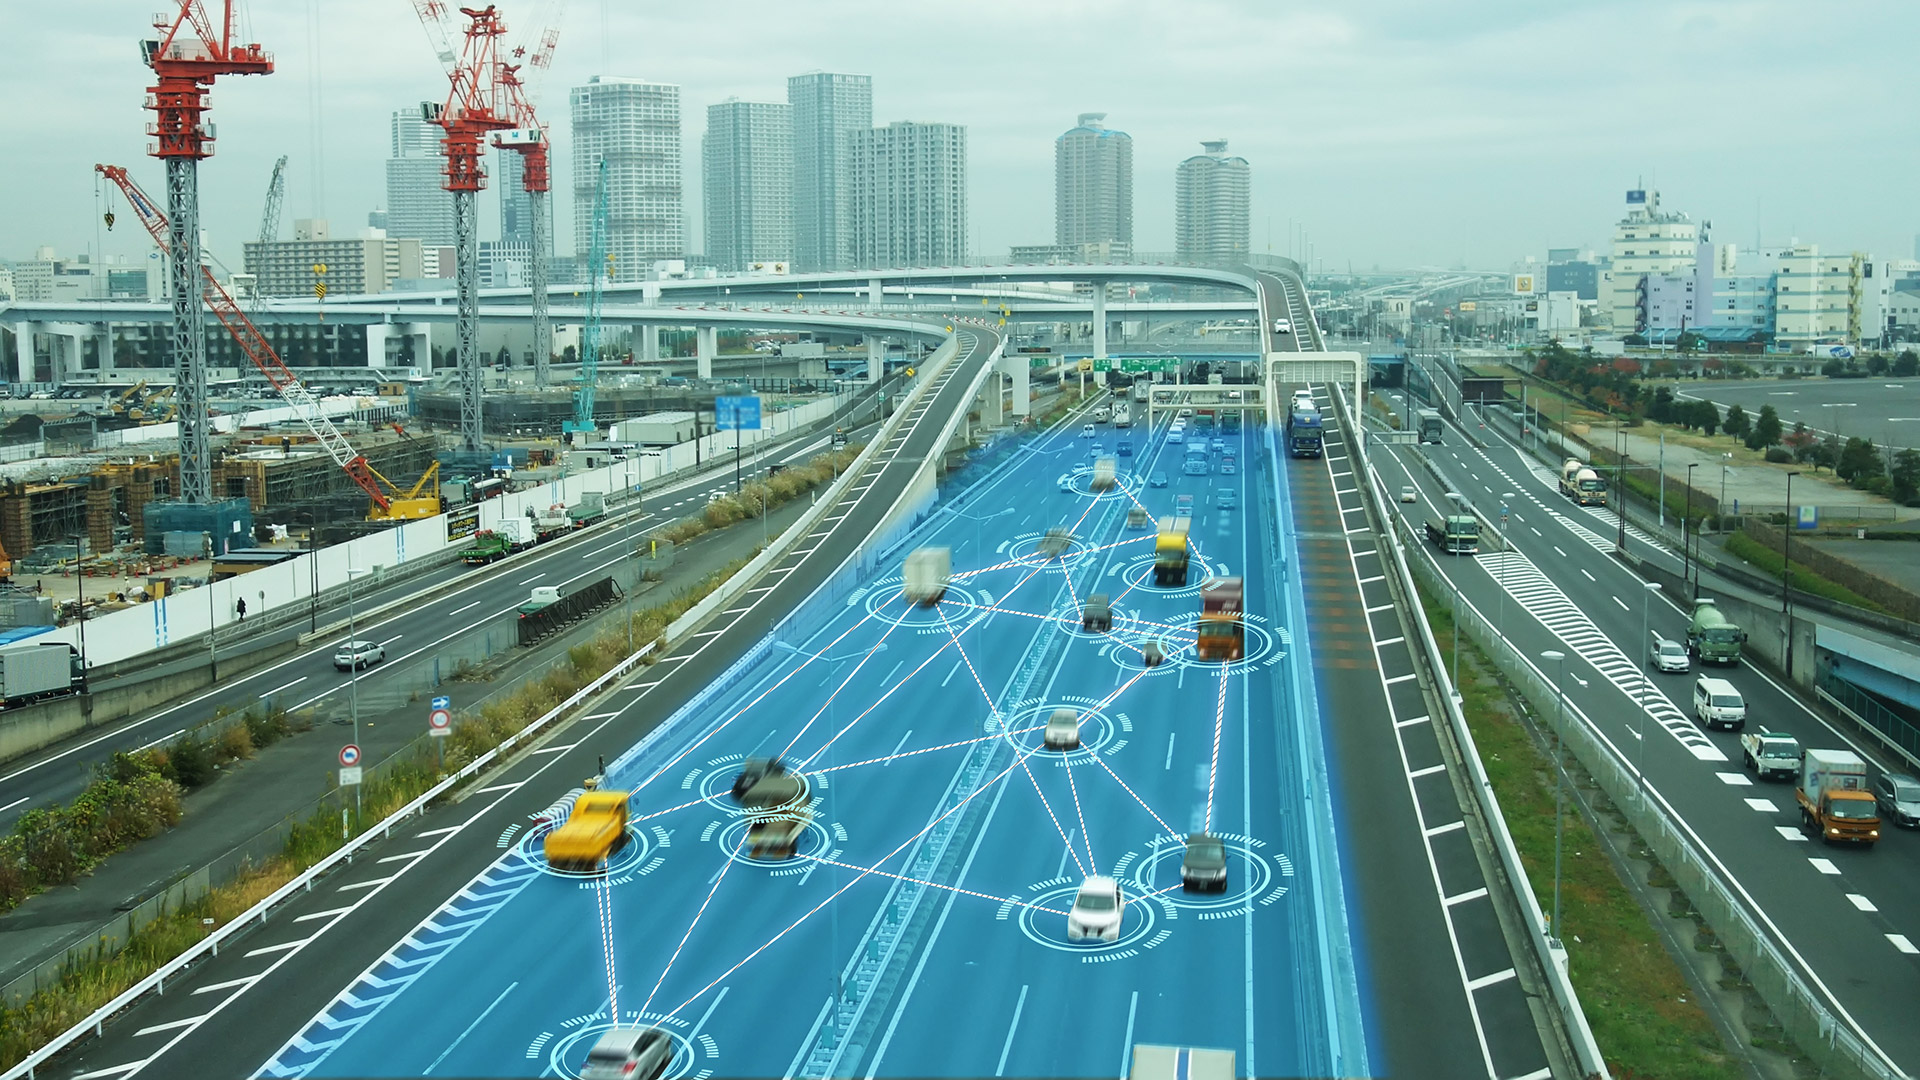 Application of AR for Enterprise in Smart City